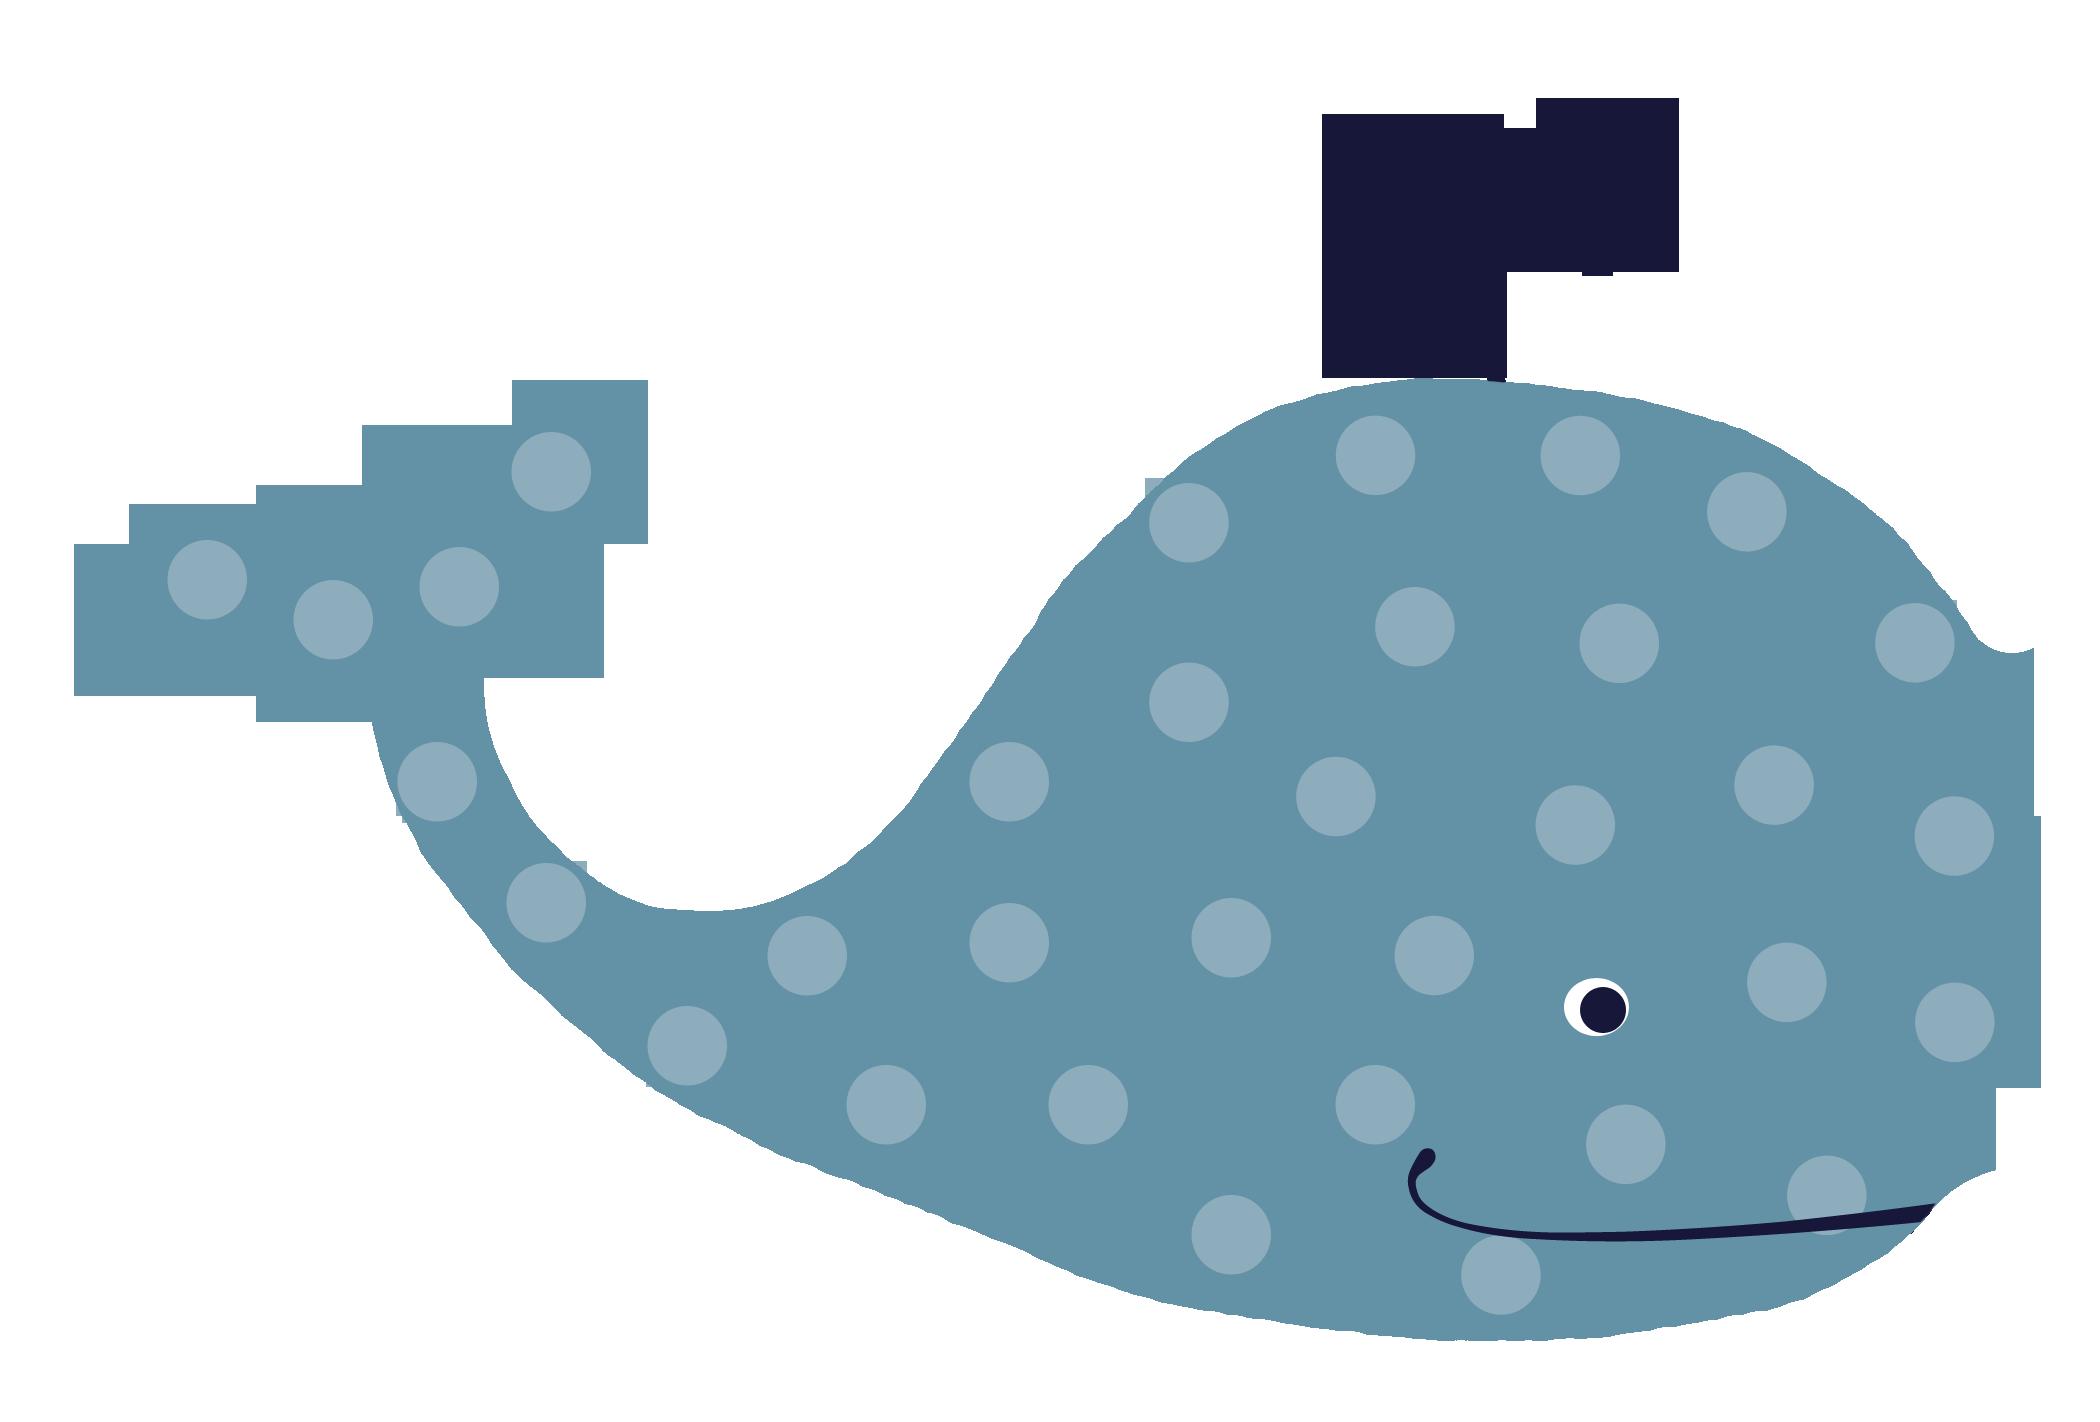 Whale nautical